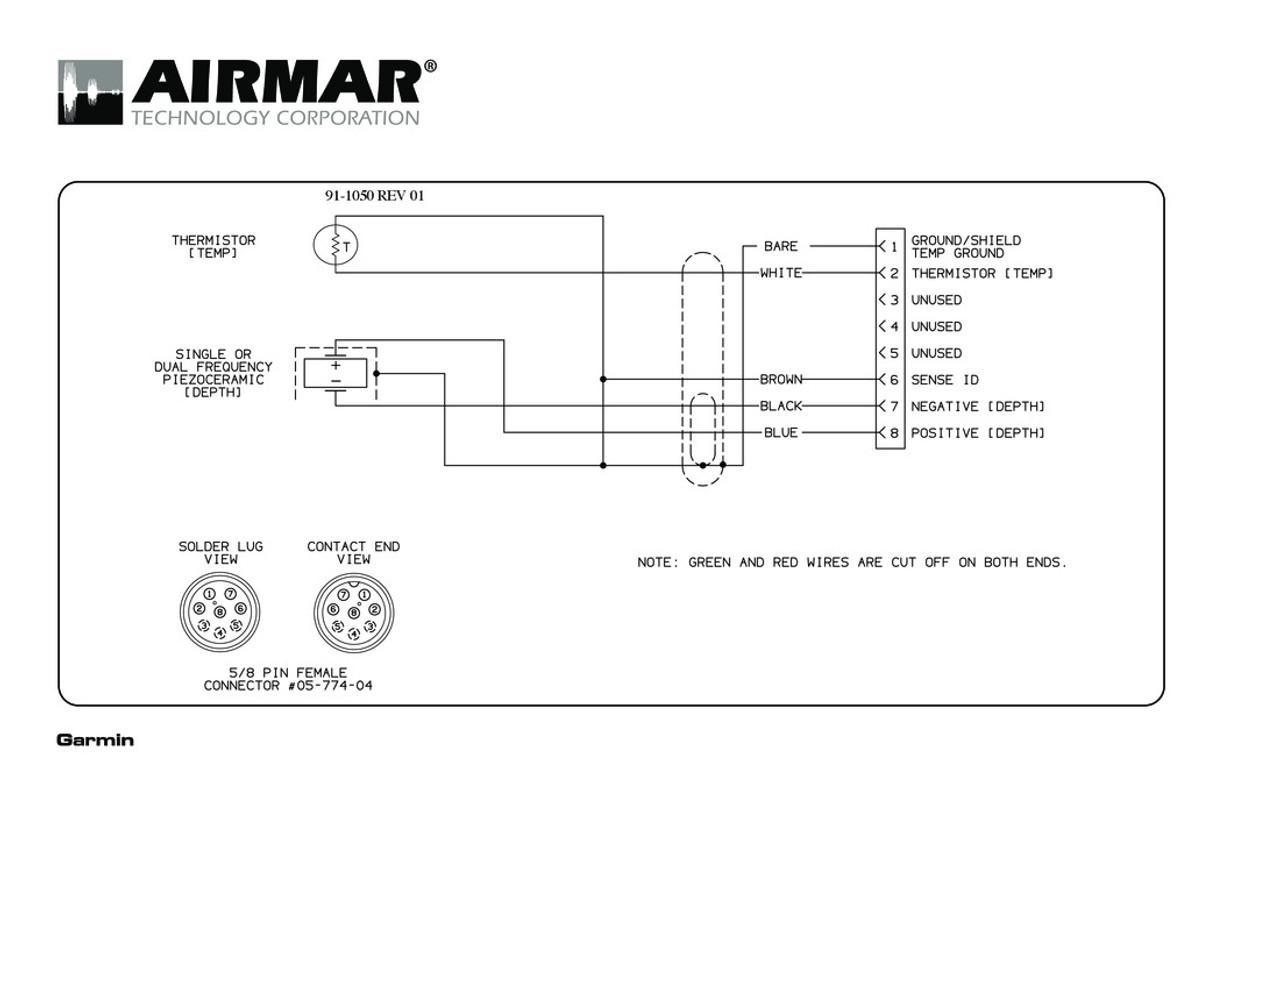 small resolution of airmar wiring diagram garmin p319 8 pin d t blue bottle marine rh bluebottlemarine com 7 pin wiring diagram trailer 7 pin wiring diagram pdf